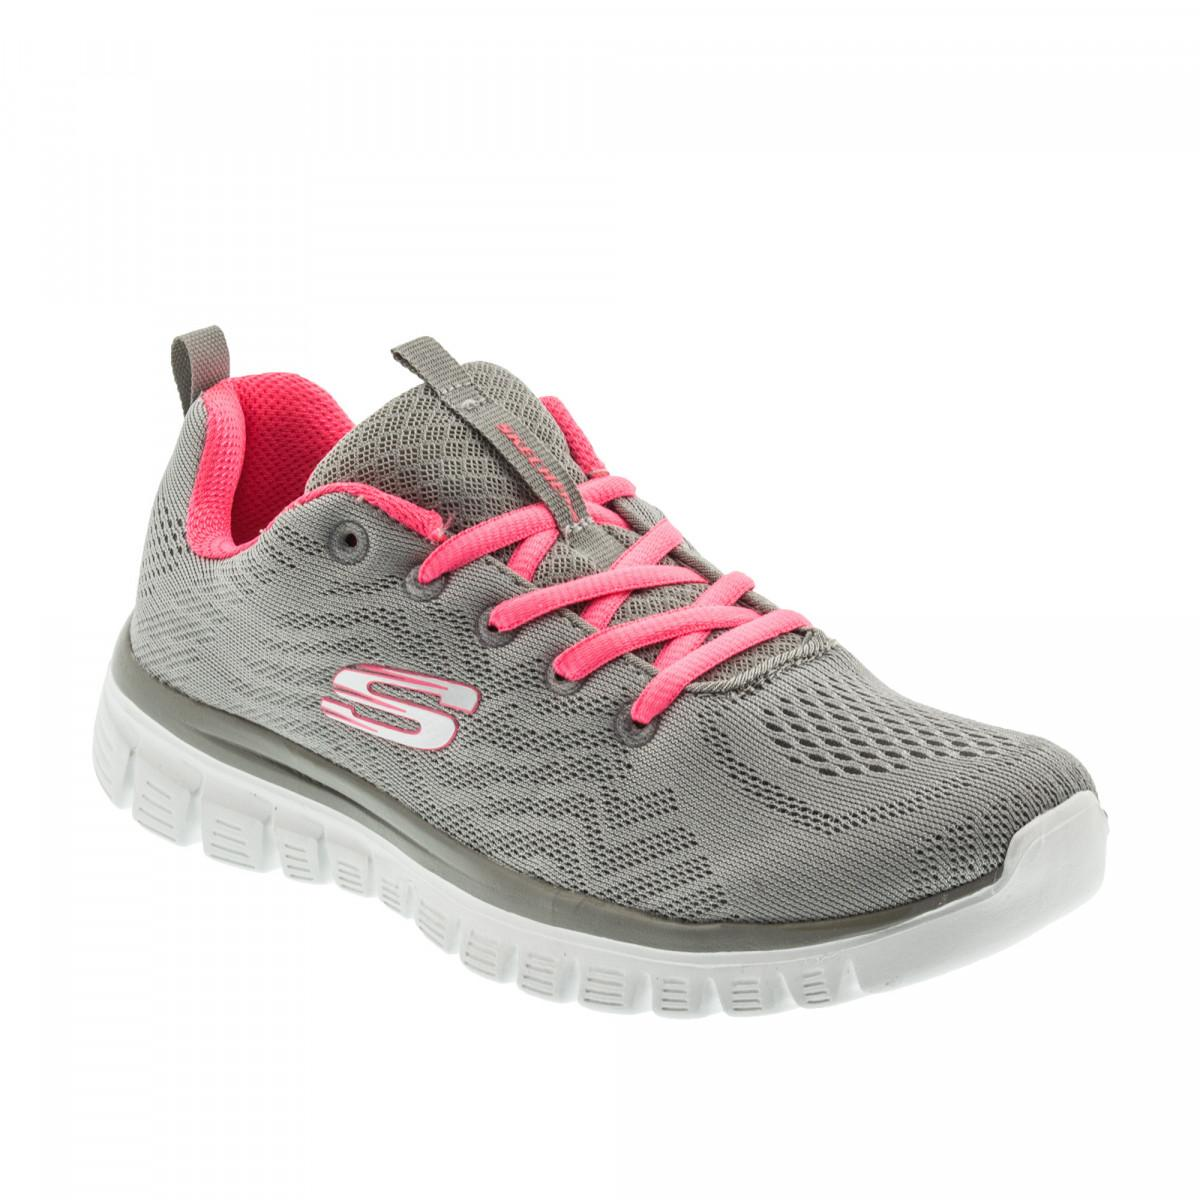 Sepatu Olahraga Wanita-Sepatu Senam Murah-Sepatu Lari-Sepatu Skechers Murah- Sepatu 49e7efa5e2